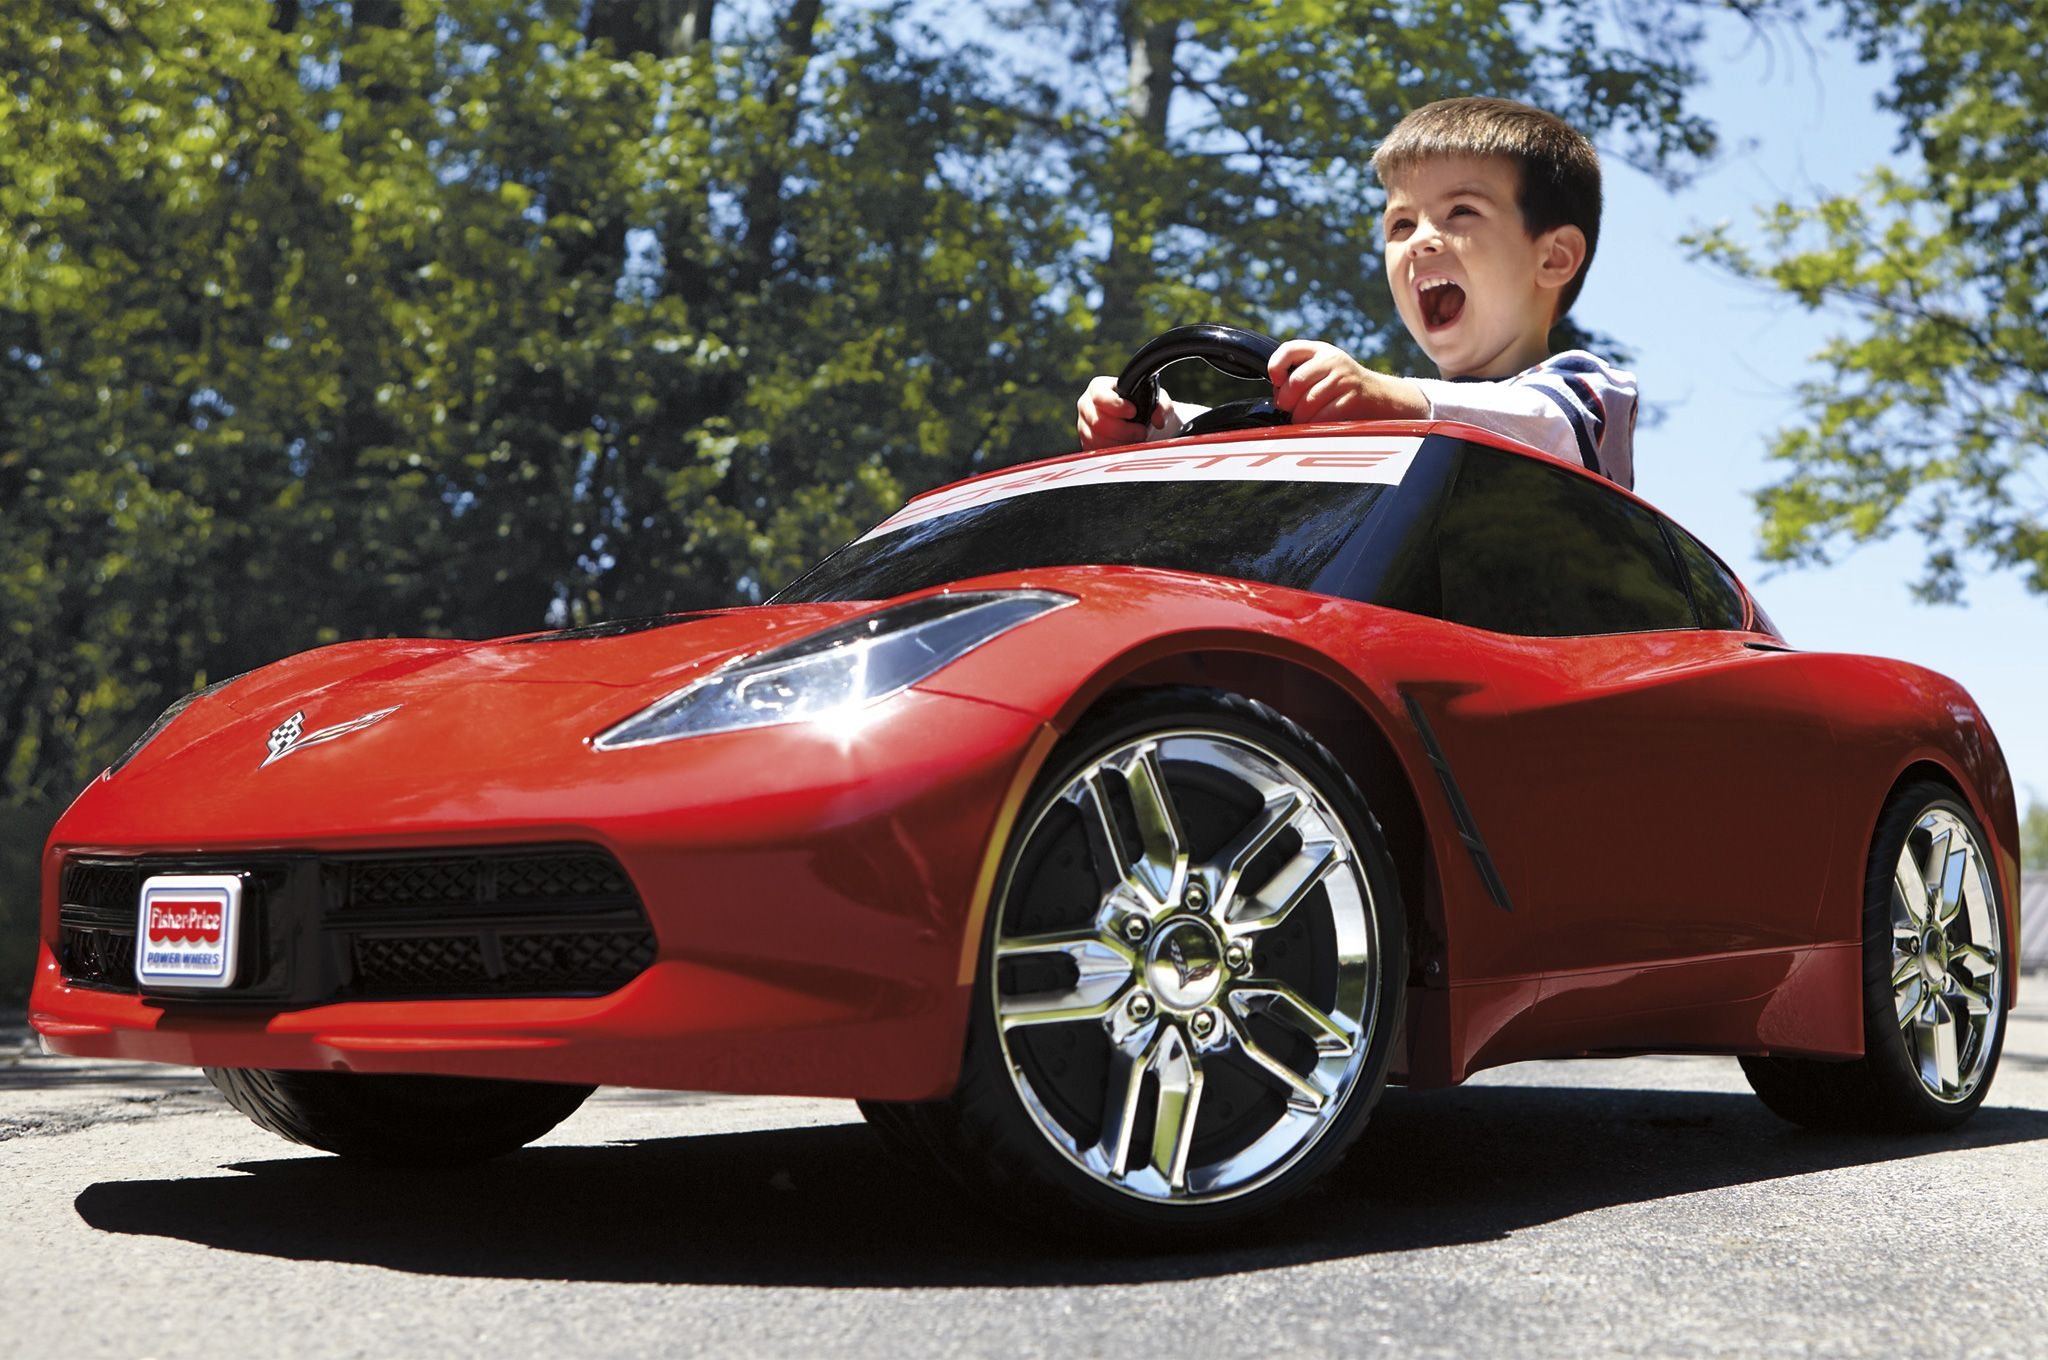 Kids Driving Cars Http Www Willisford Net Kids Driving Cars